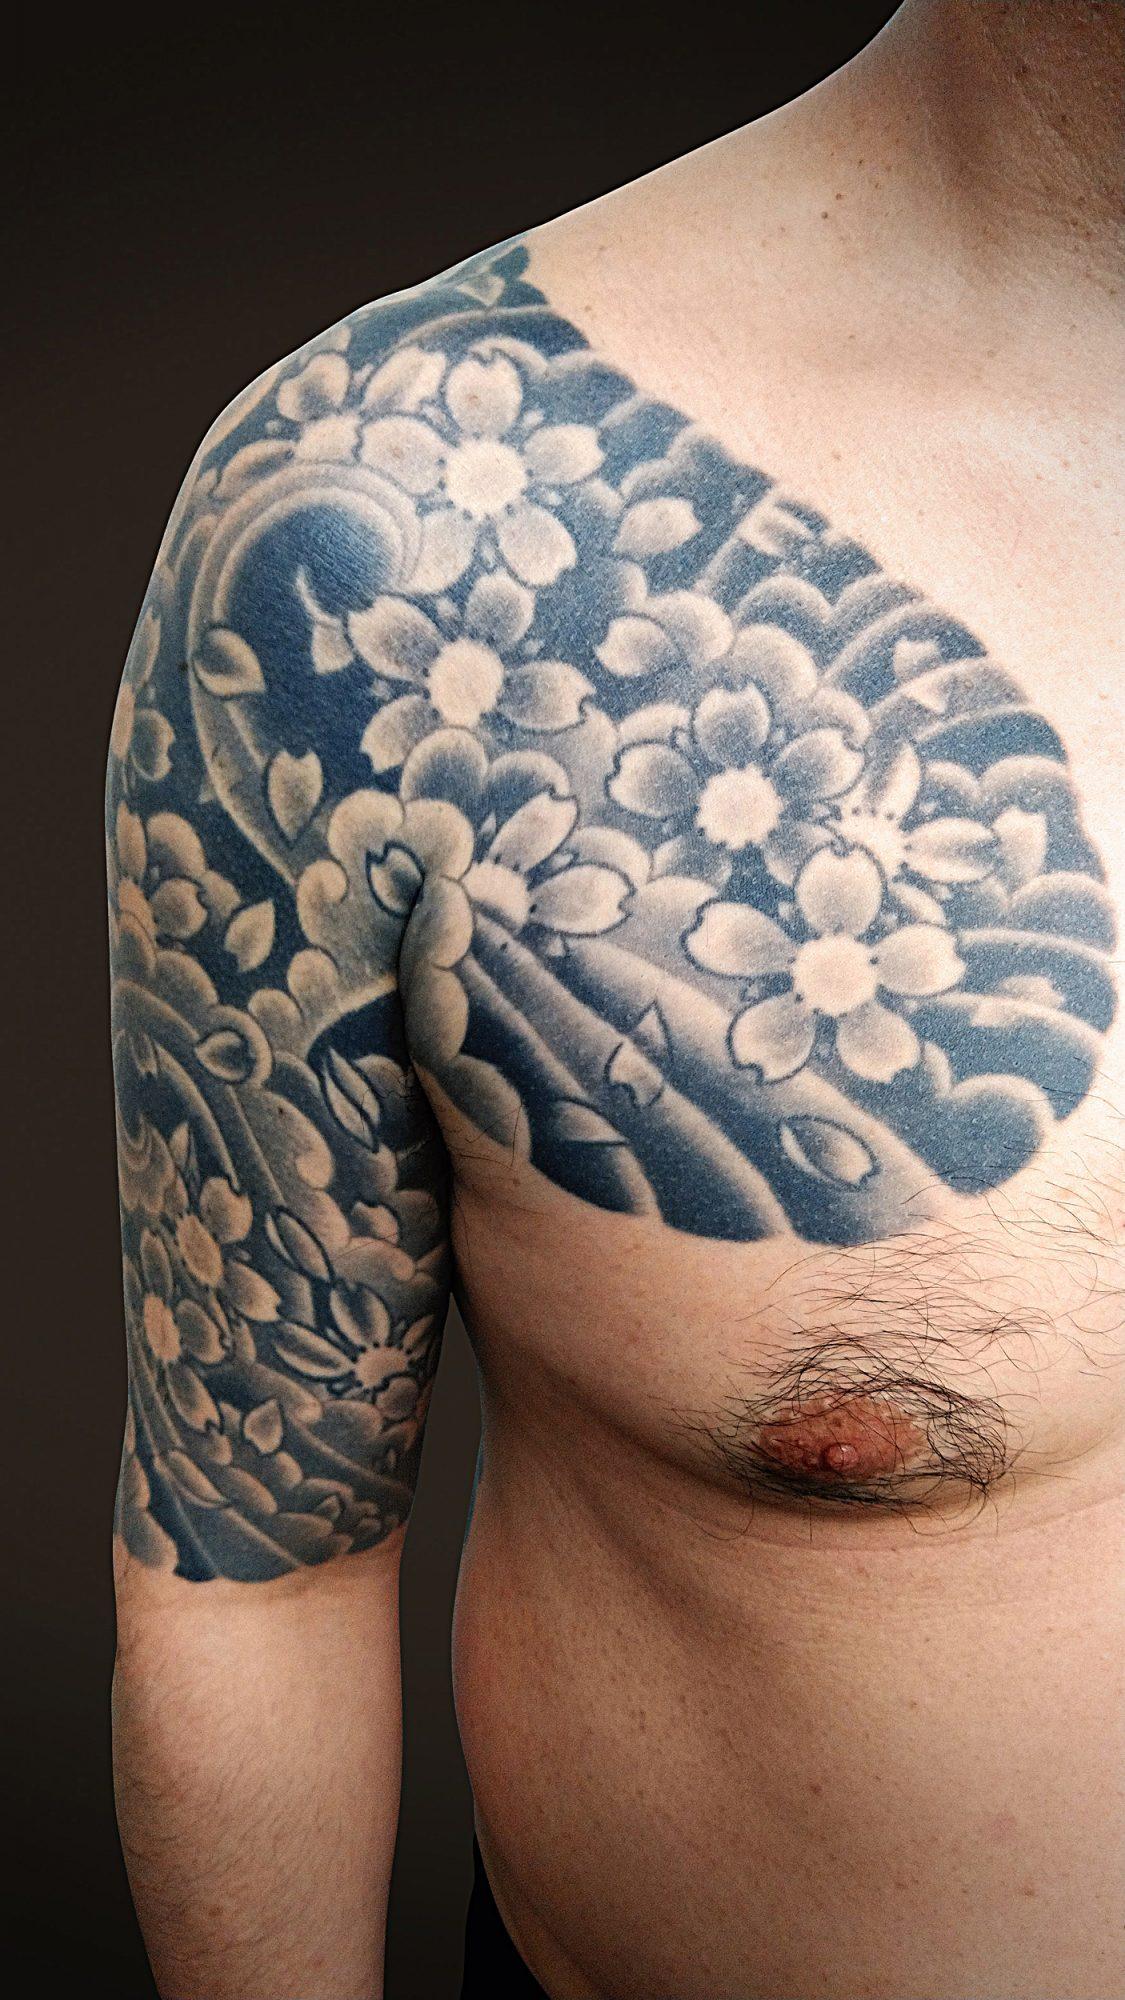 KINGRAT TATTOO 作品 | LAVA gallery | Tattoo artist: Yuji Anai | キングラット | ラバギャラリー | タトゥーアート | 福岡県北九州市 | 20210718_08b